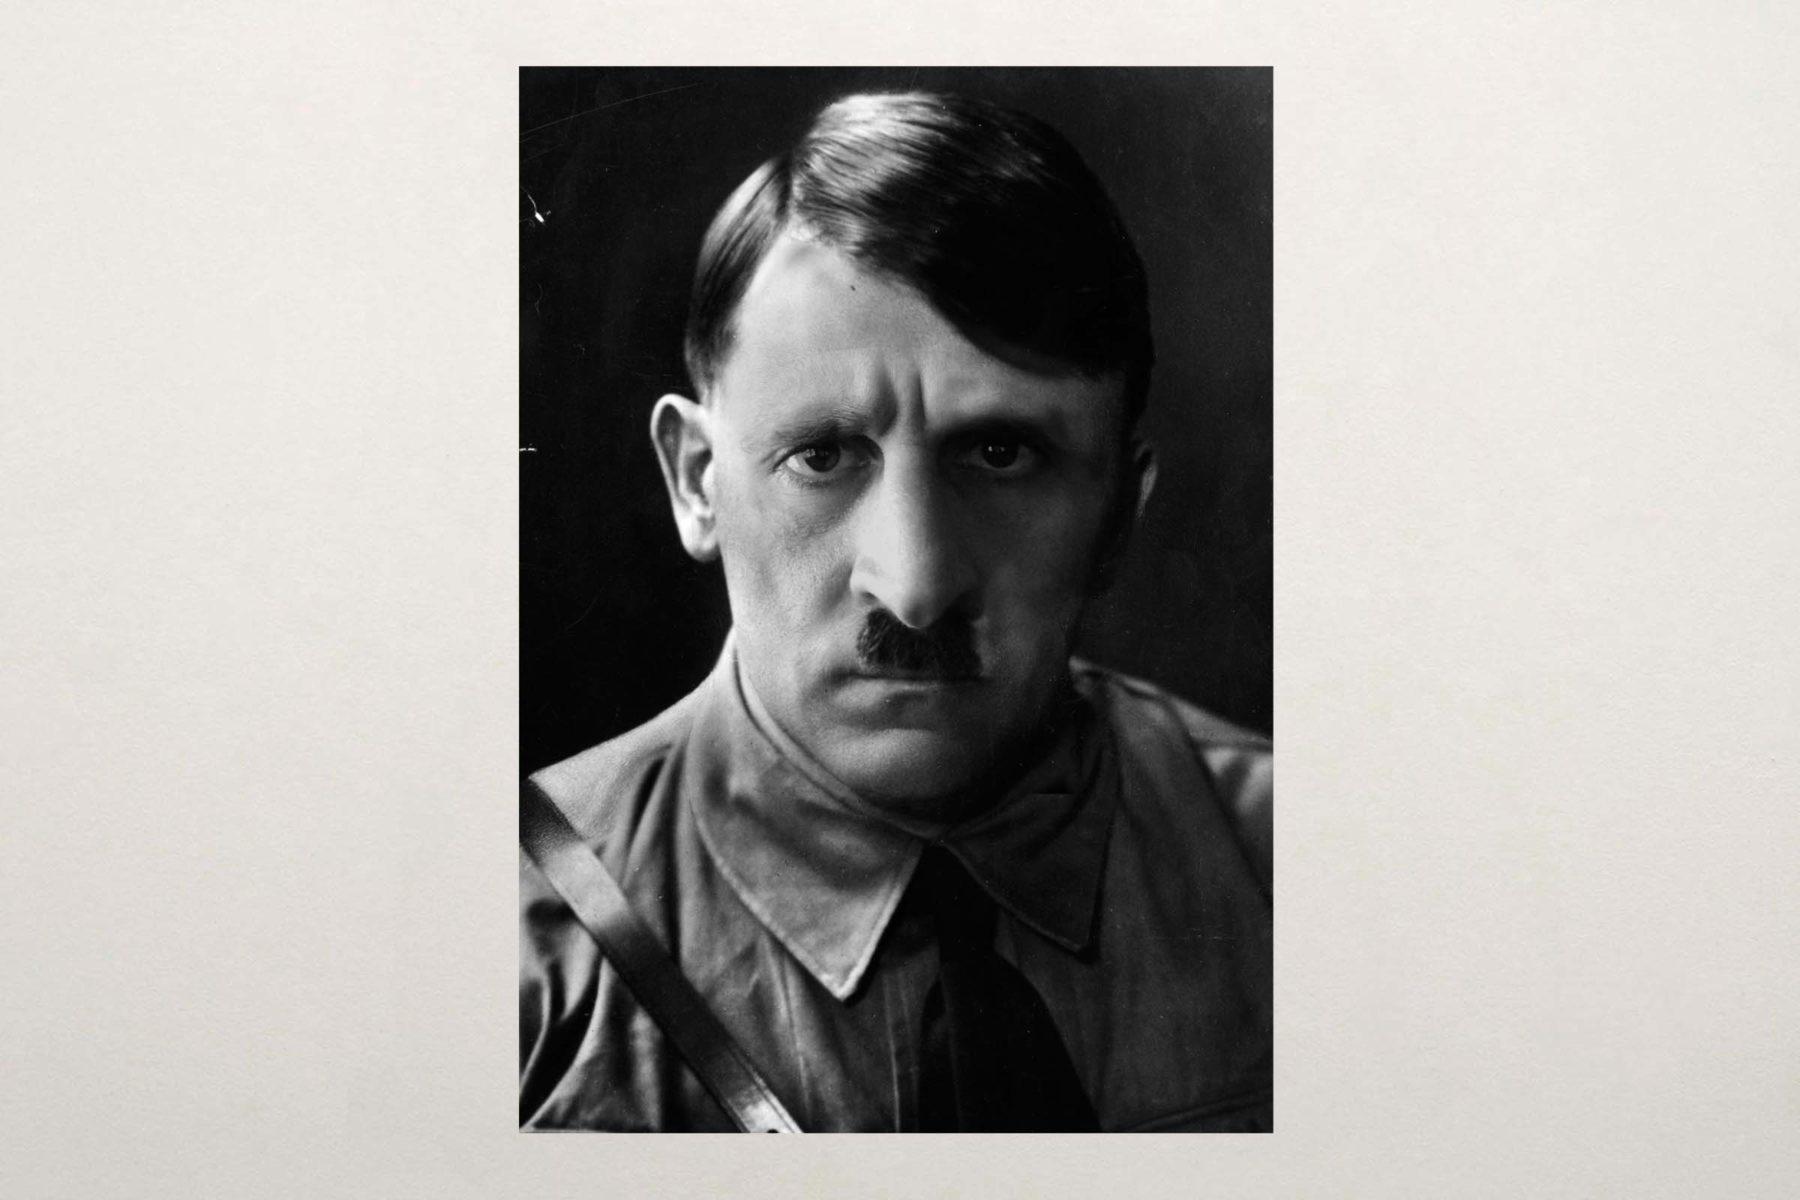 Matteo Attruia, Selfportrait, 2012, inkjet print